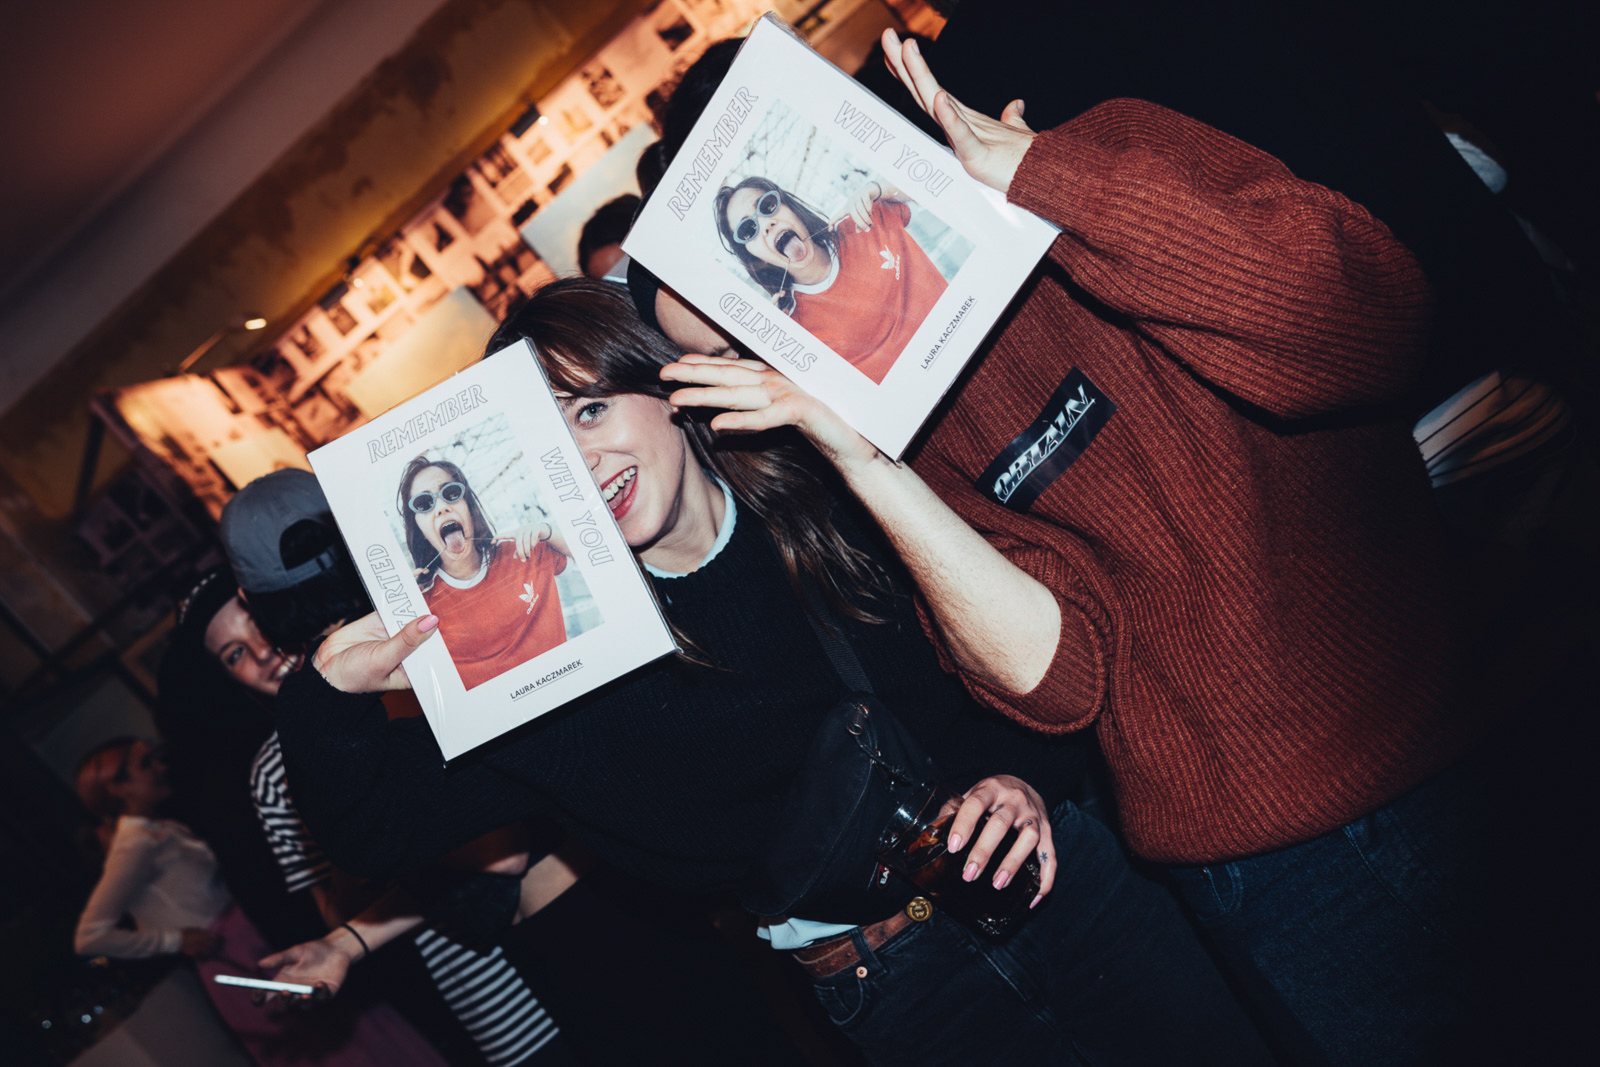 2019_RebeccaRuetten_Web_Girlsareawesome-15.jpg